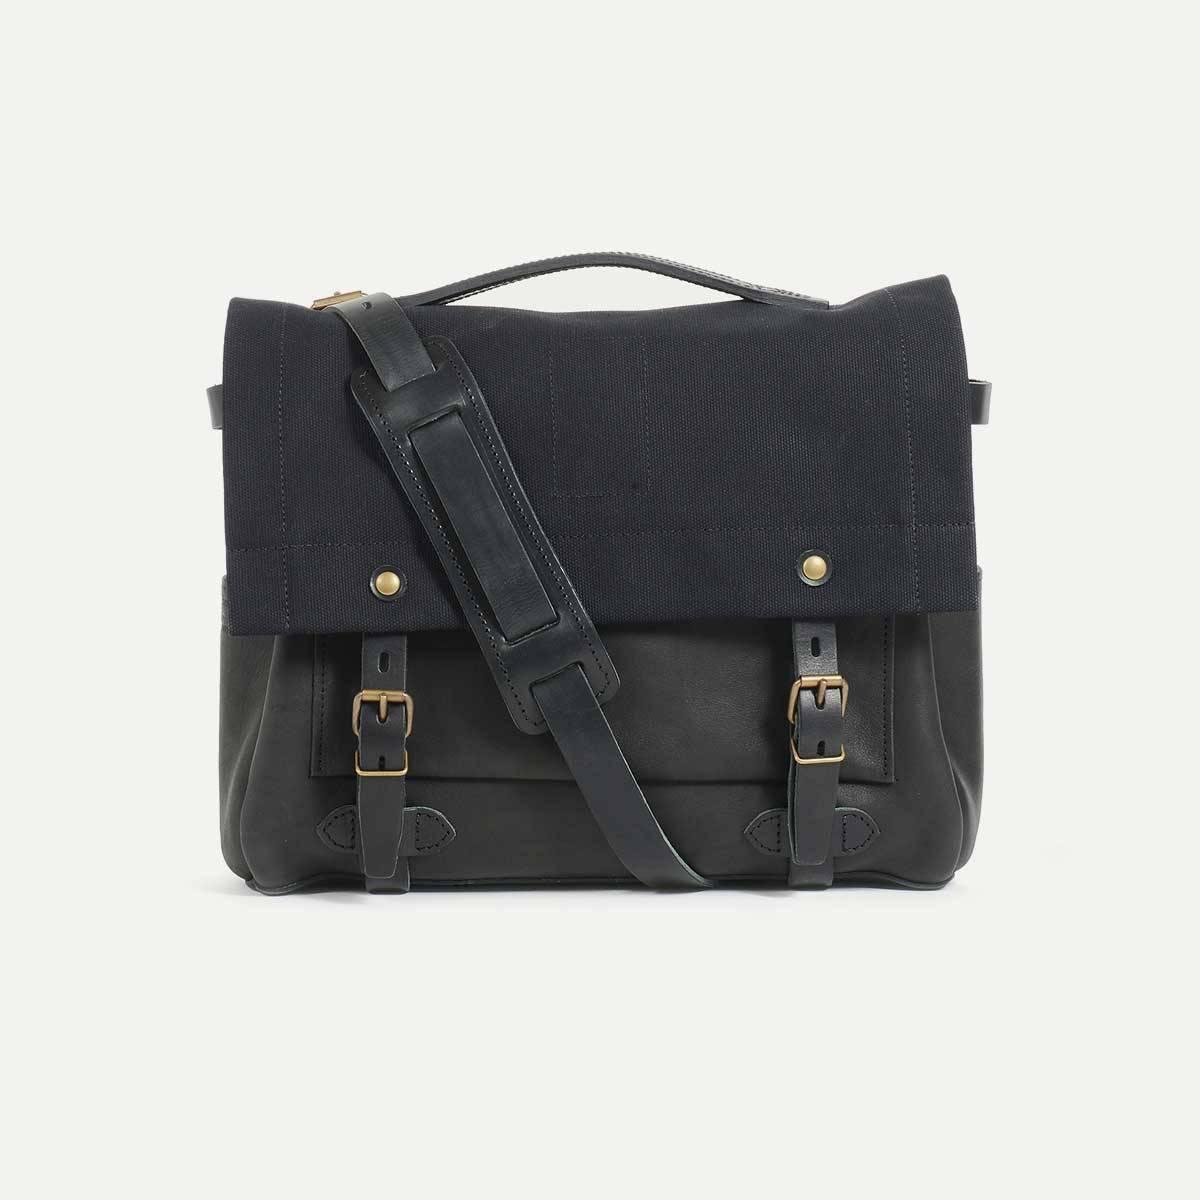 sac postier eclair noir bleu de chauffe. Black Bedroom Furniture Sets. Home Design Ideas